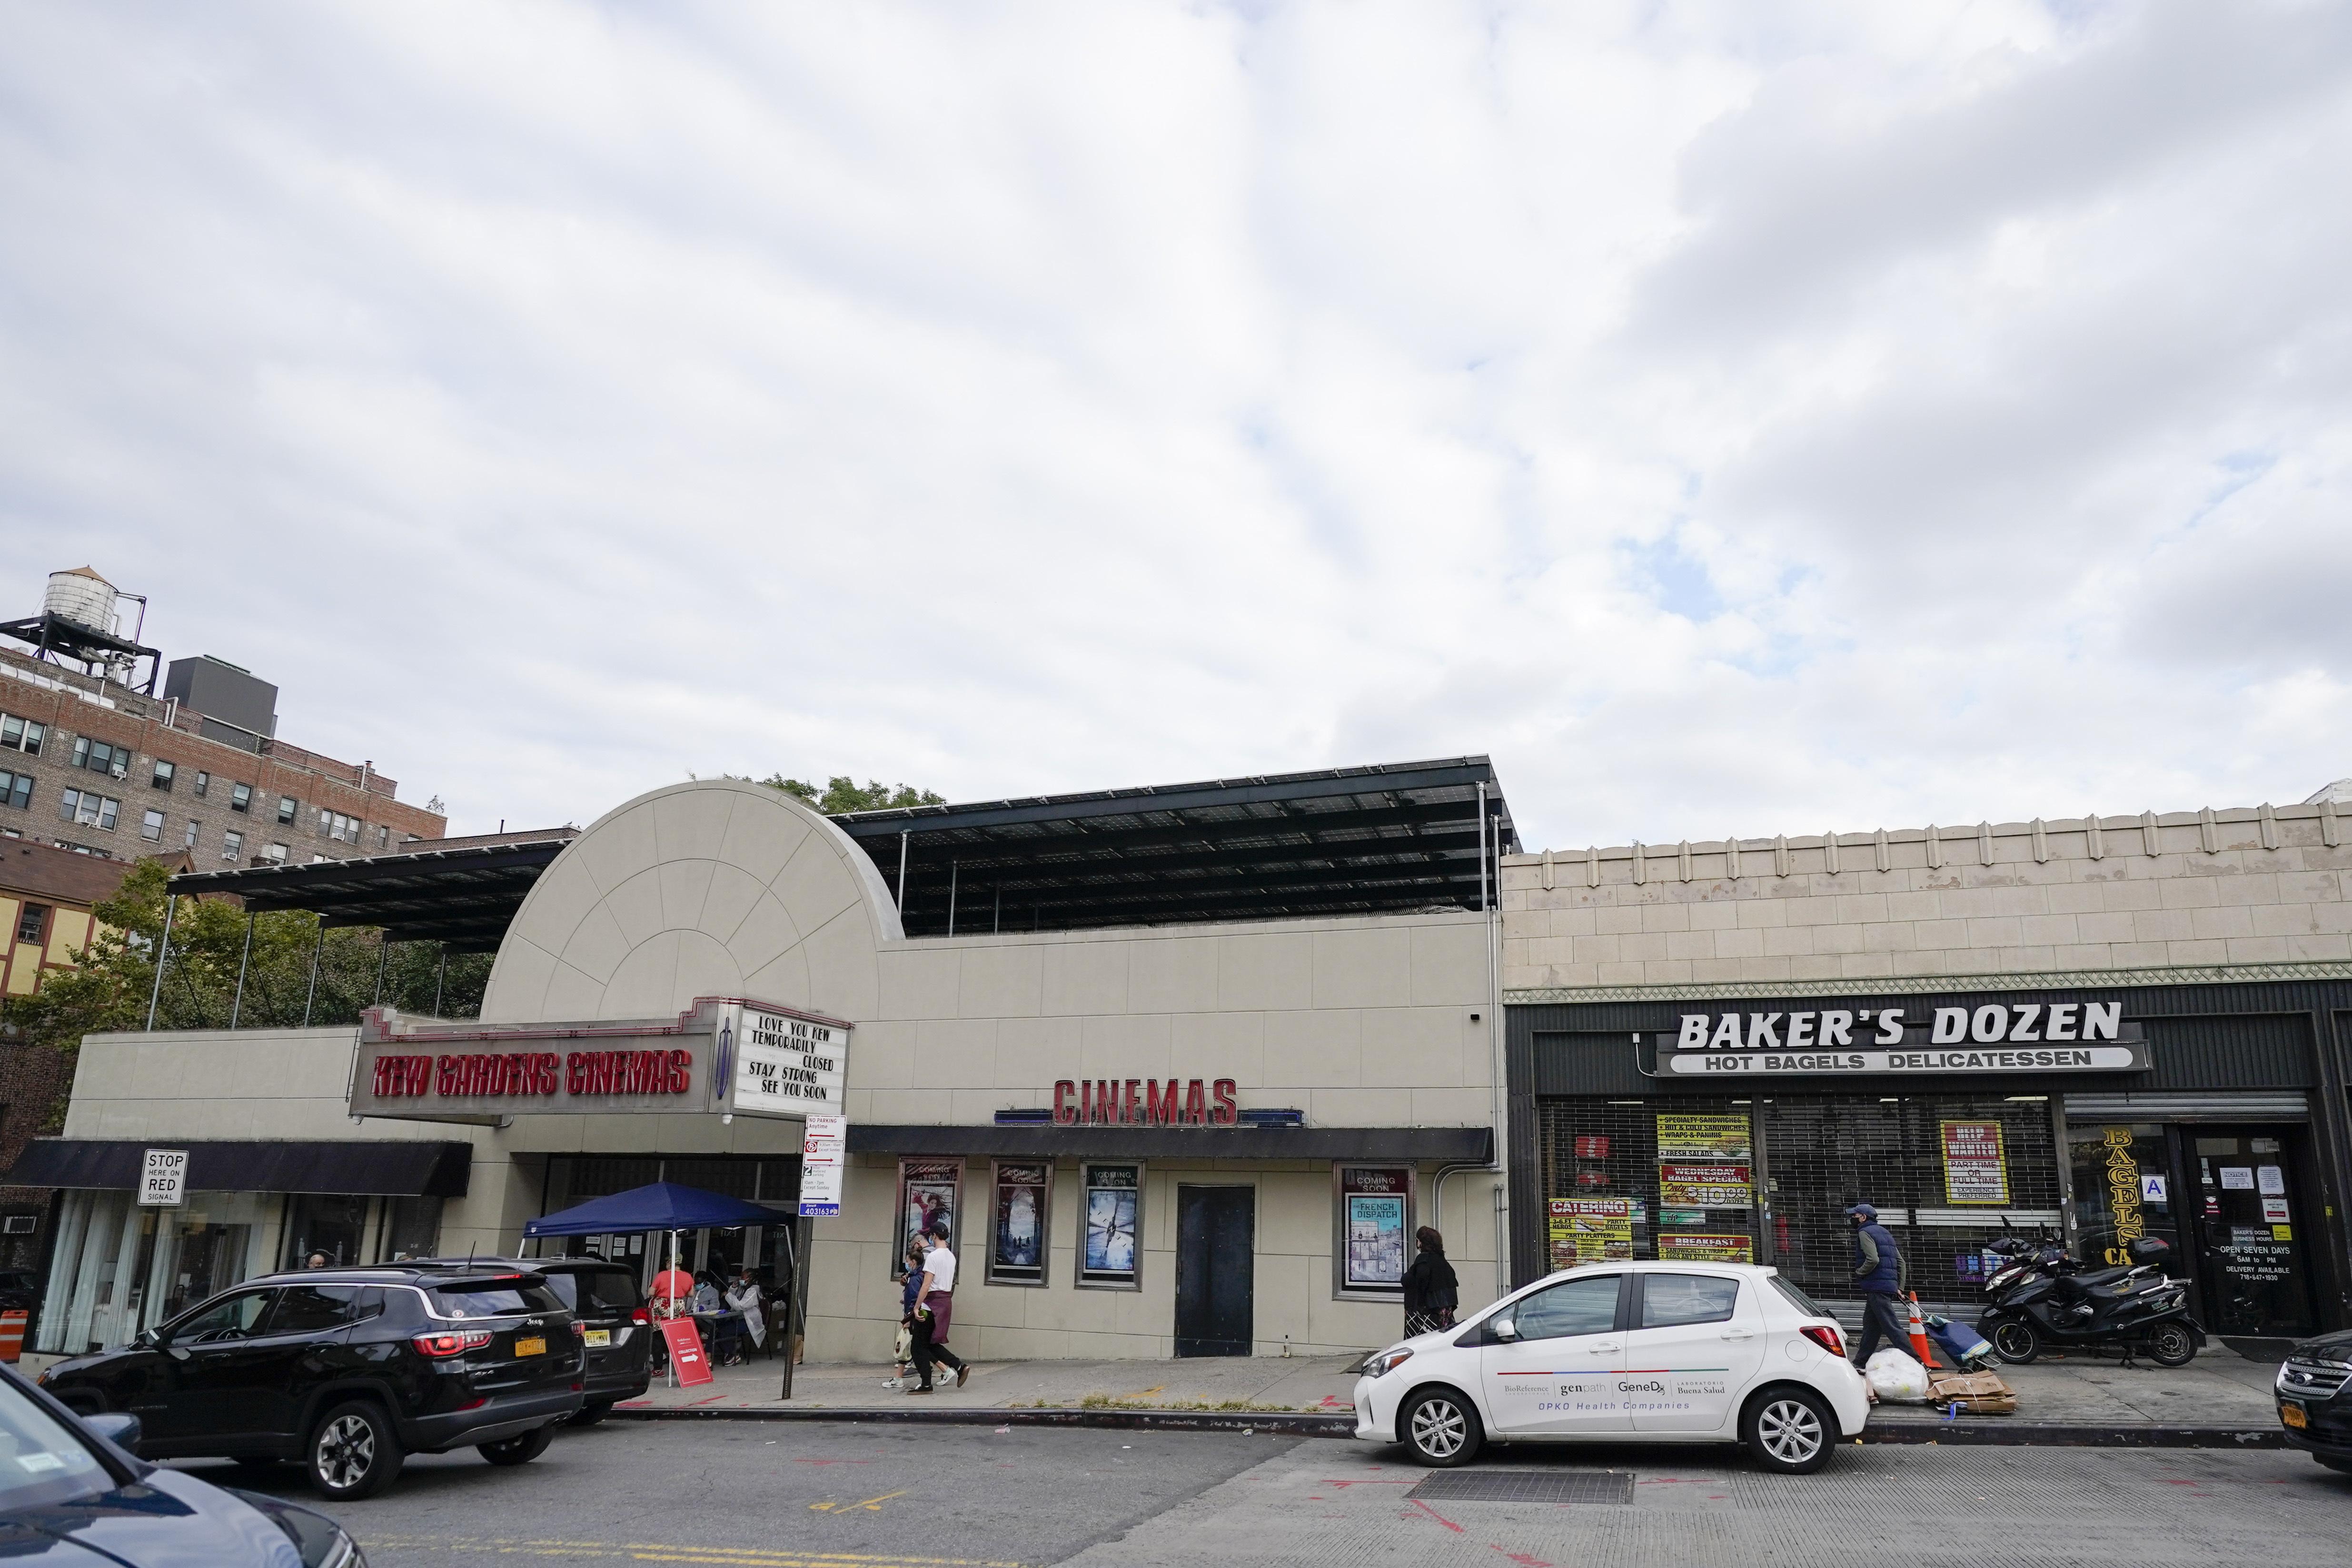 Pedestrians pass businesses on Lefferts Blvd., in Kew Gardens, Queens on October 5th, 2020.